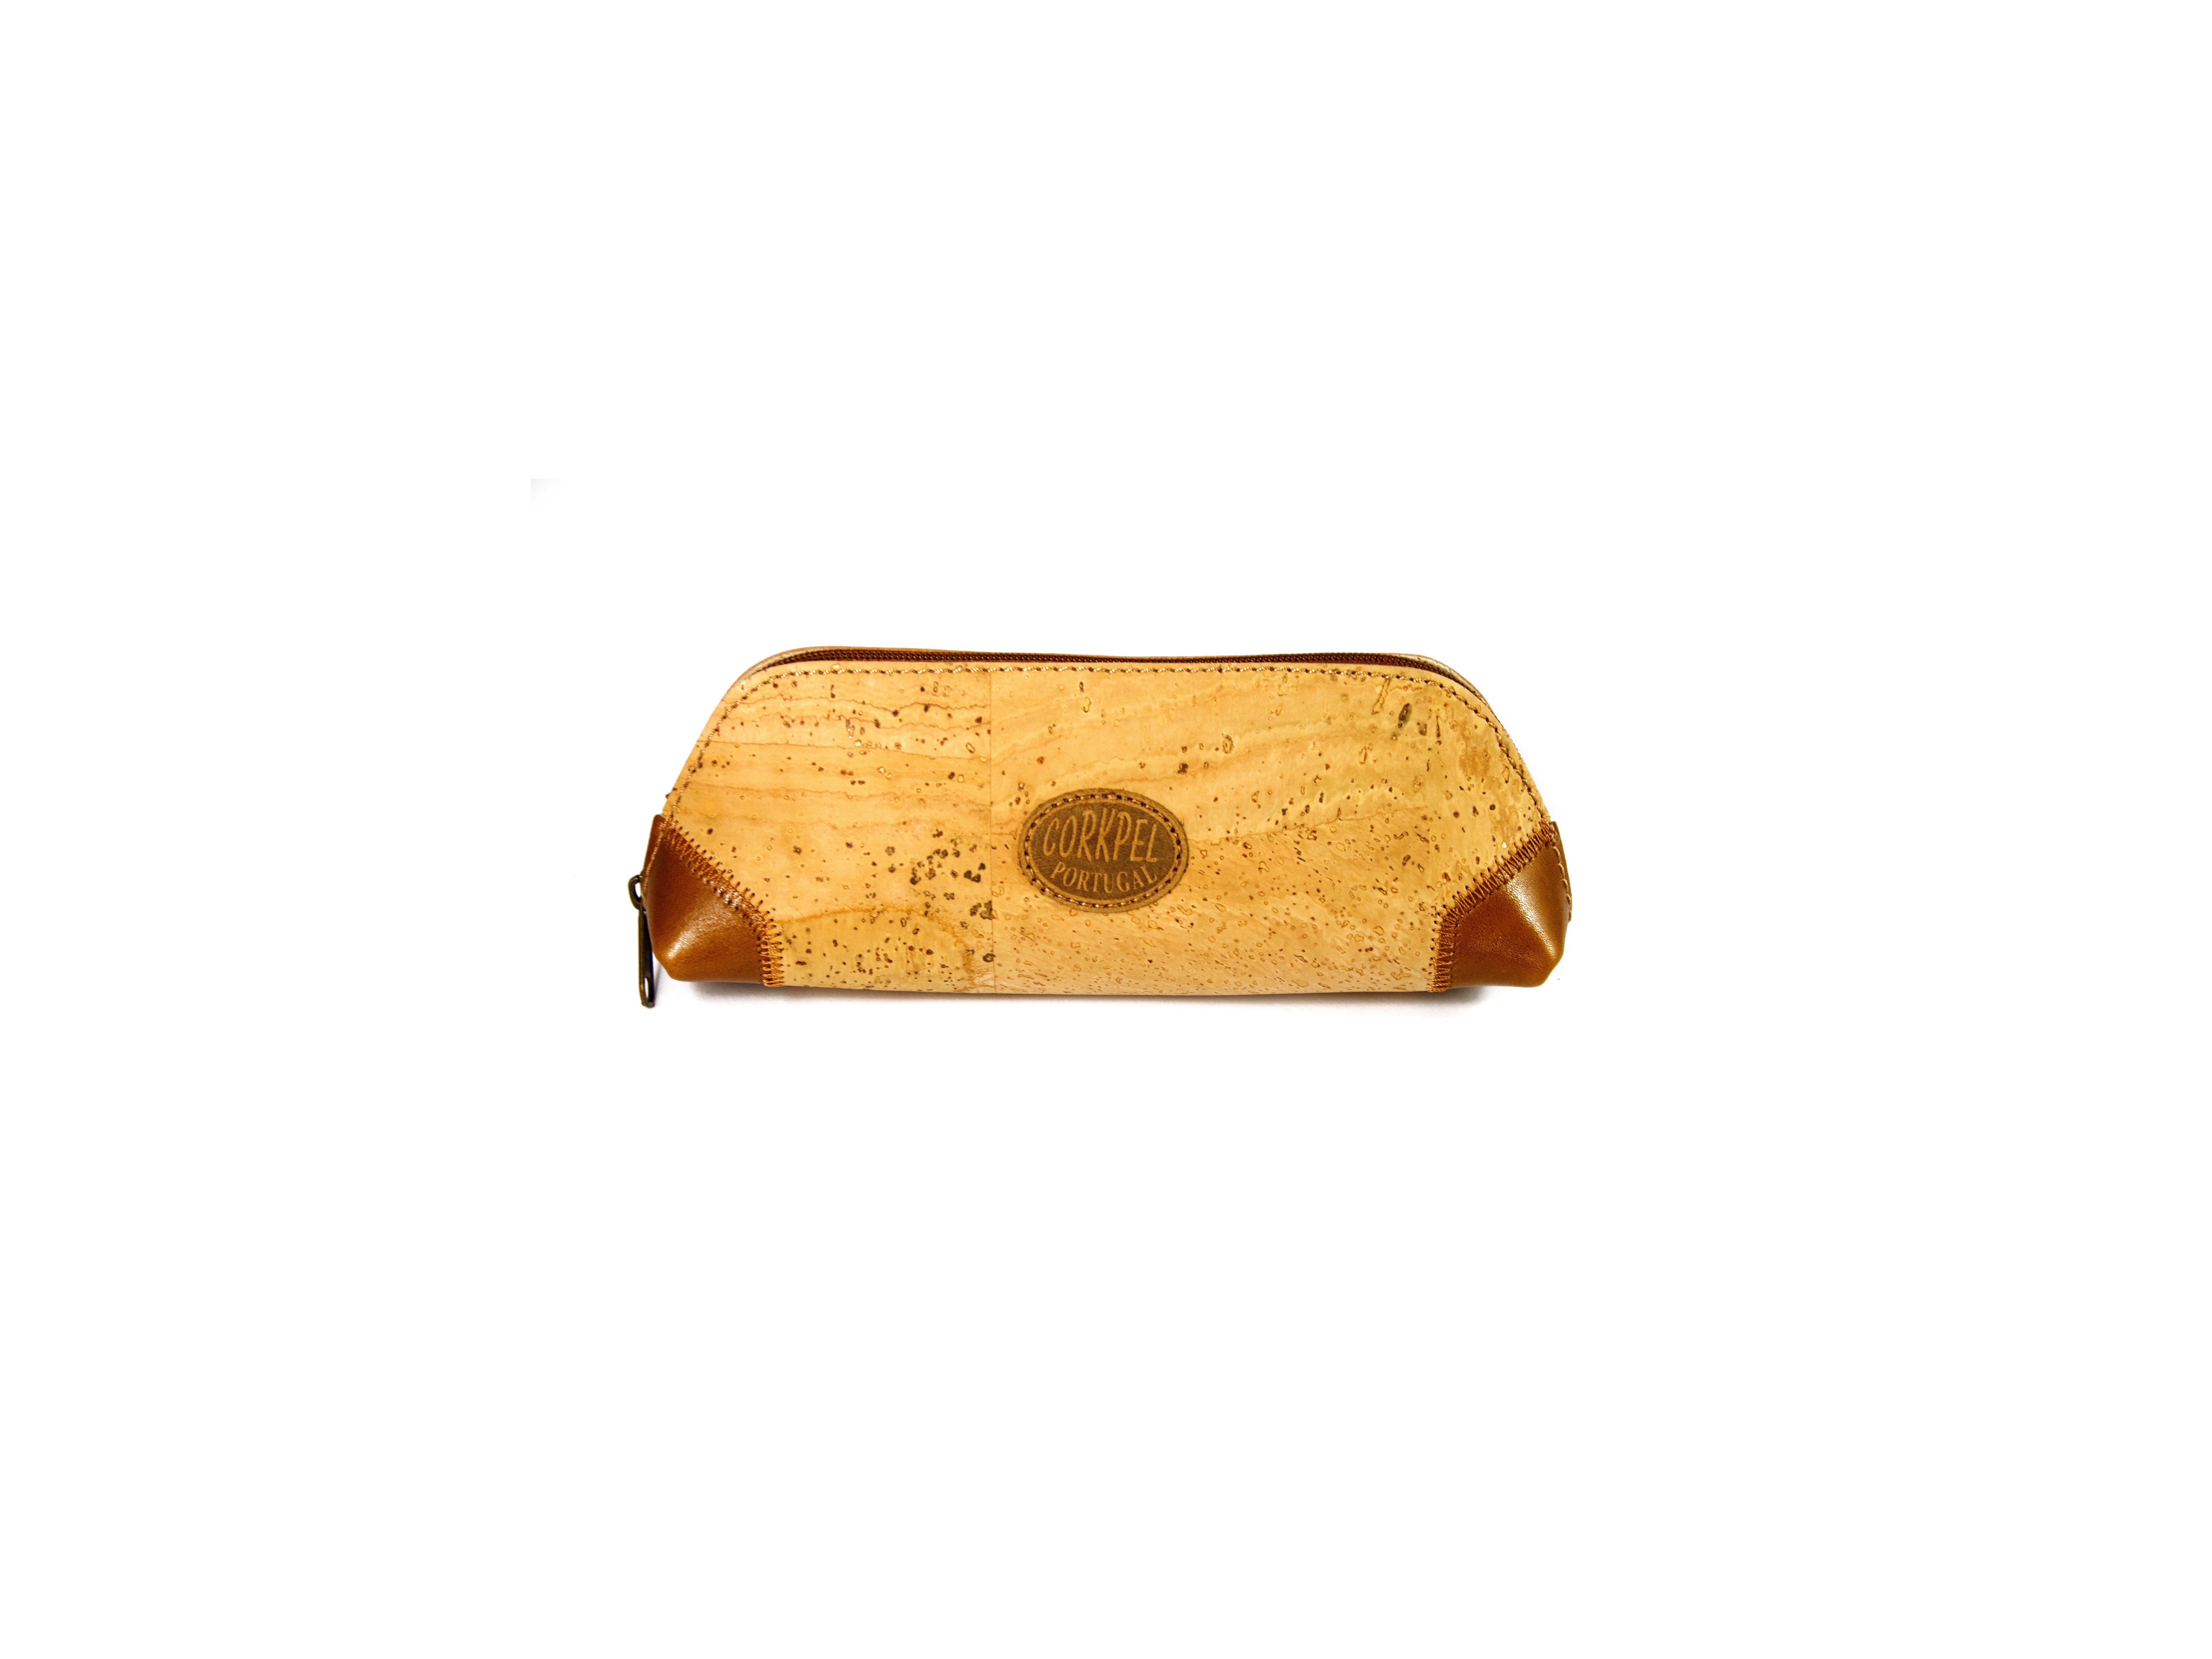 Buy pencil-box ld. Buy pencil-box ld in Spain. Buy pencil-box ld in Portugal. Buy pencil-box ld in the Canary Islands